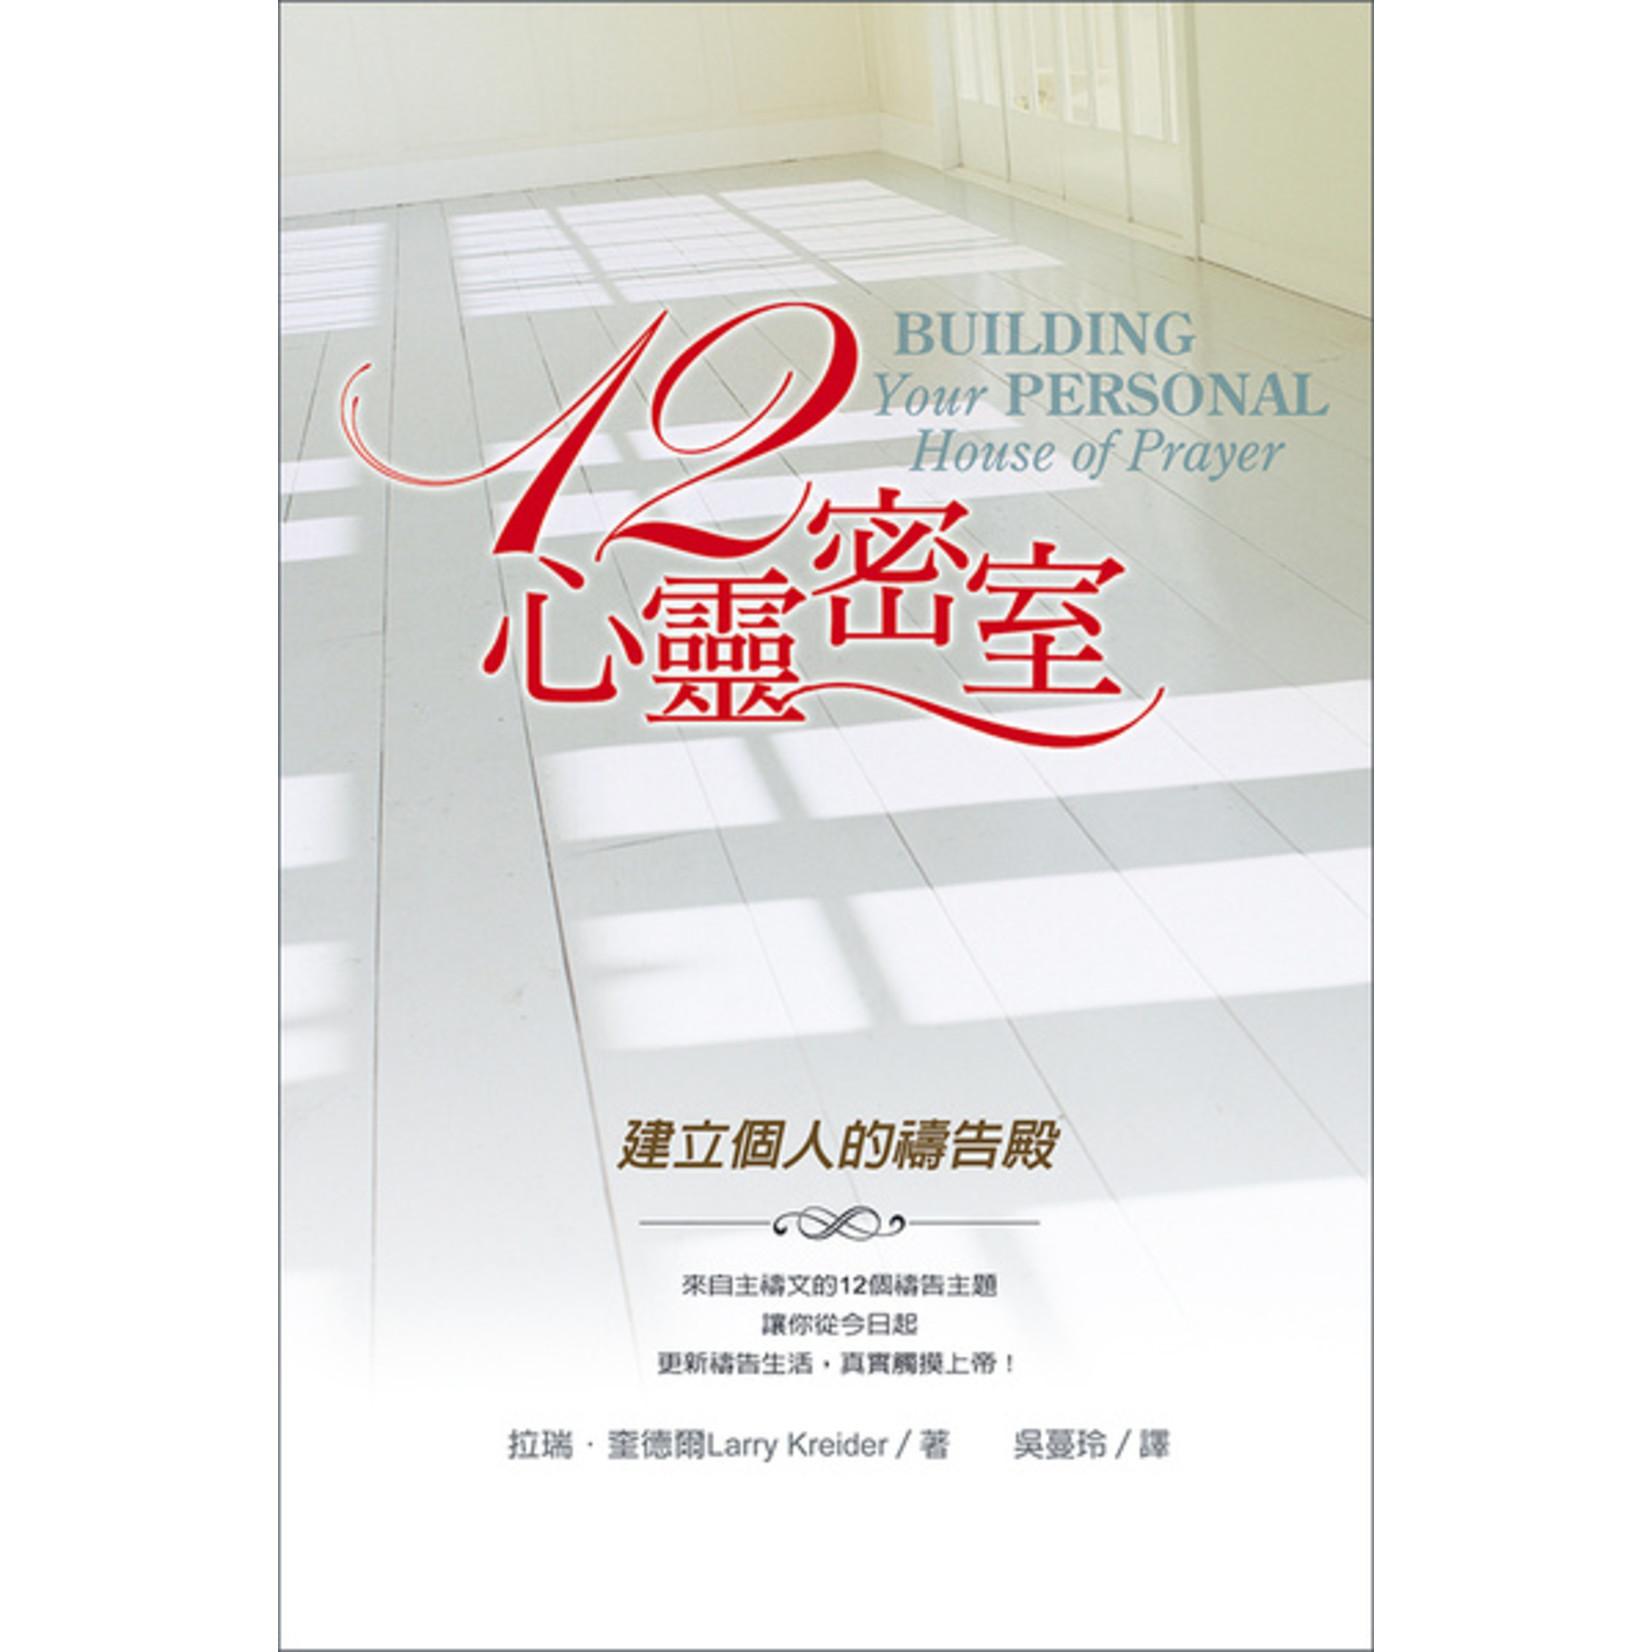 道聲 Taosheng Taiwan 12心靈密室:建立個人的禱告殿 Building Your Personal House of Prayer